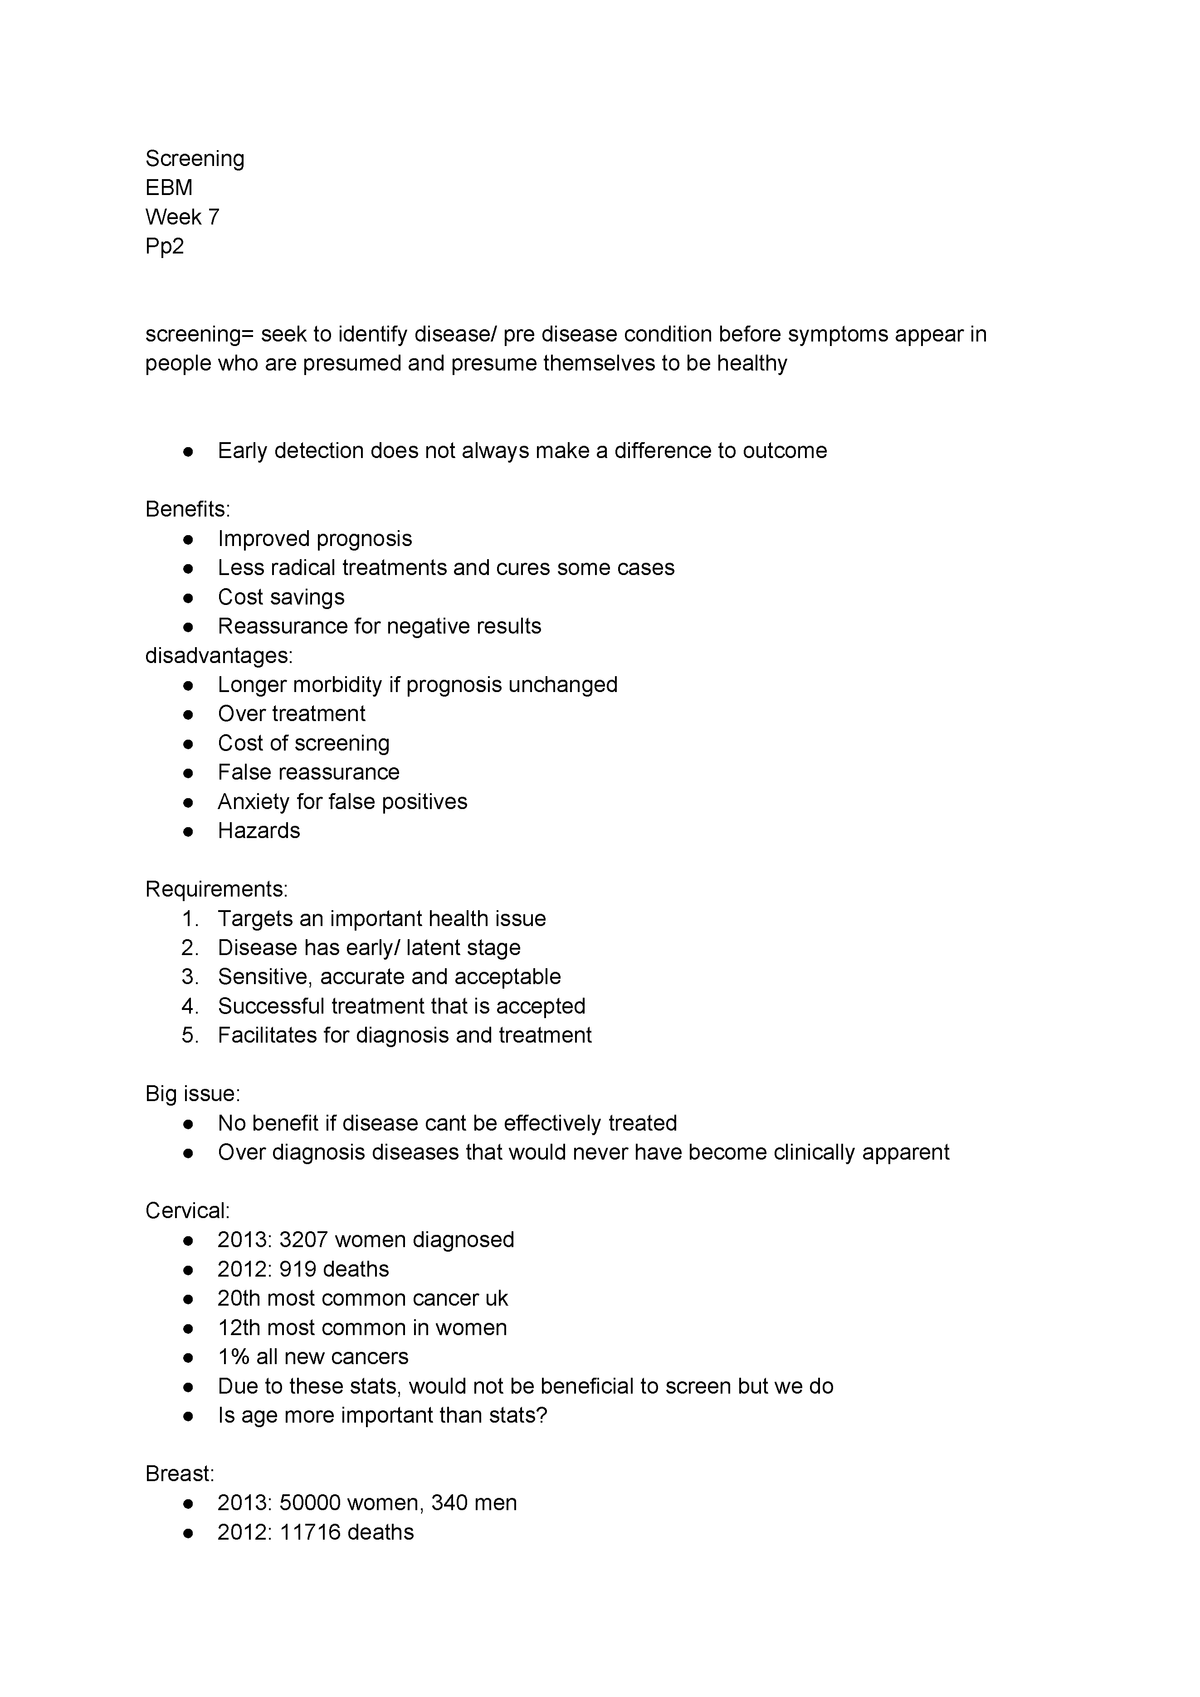 Cancer screening lecture notes - U14675 - Brookes - StuDocu